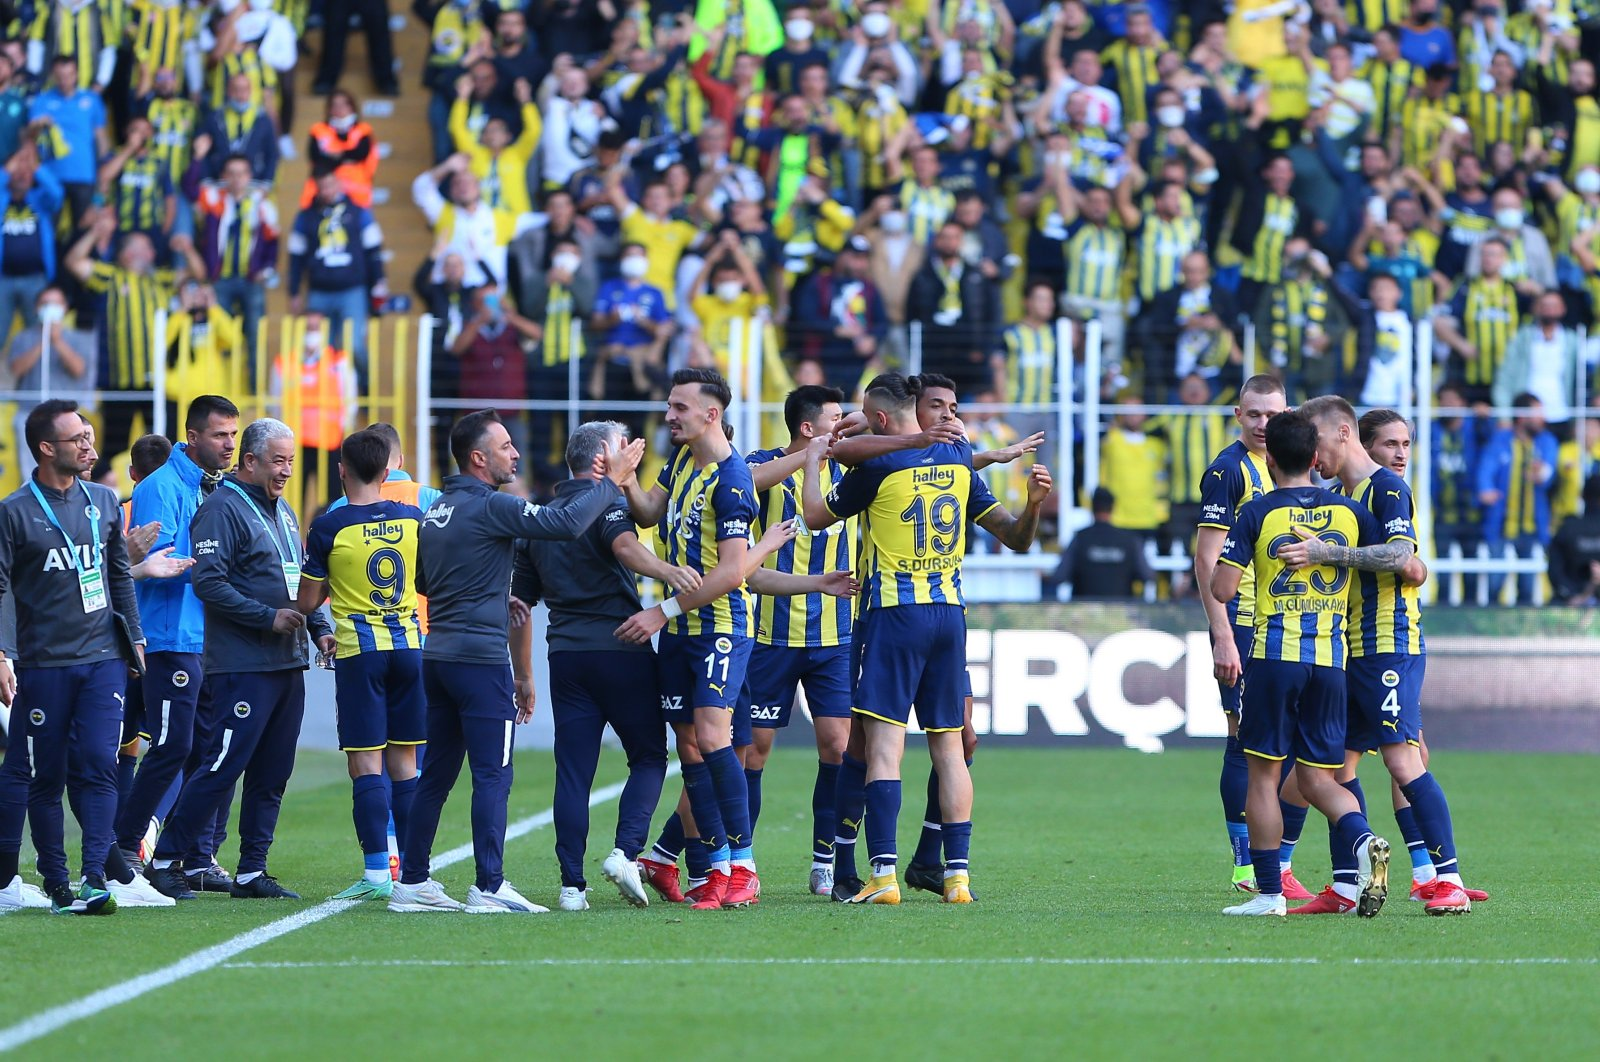 Fenerbahçe players celebrate after scoring a goal in a Süper Lig match against Kasımpaşa at Şükrü Saraçoğlu Stadium, Istanbul, Turkey, Oct 3, 2021. (Photo by Mustafa Nacar)